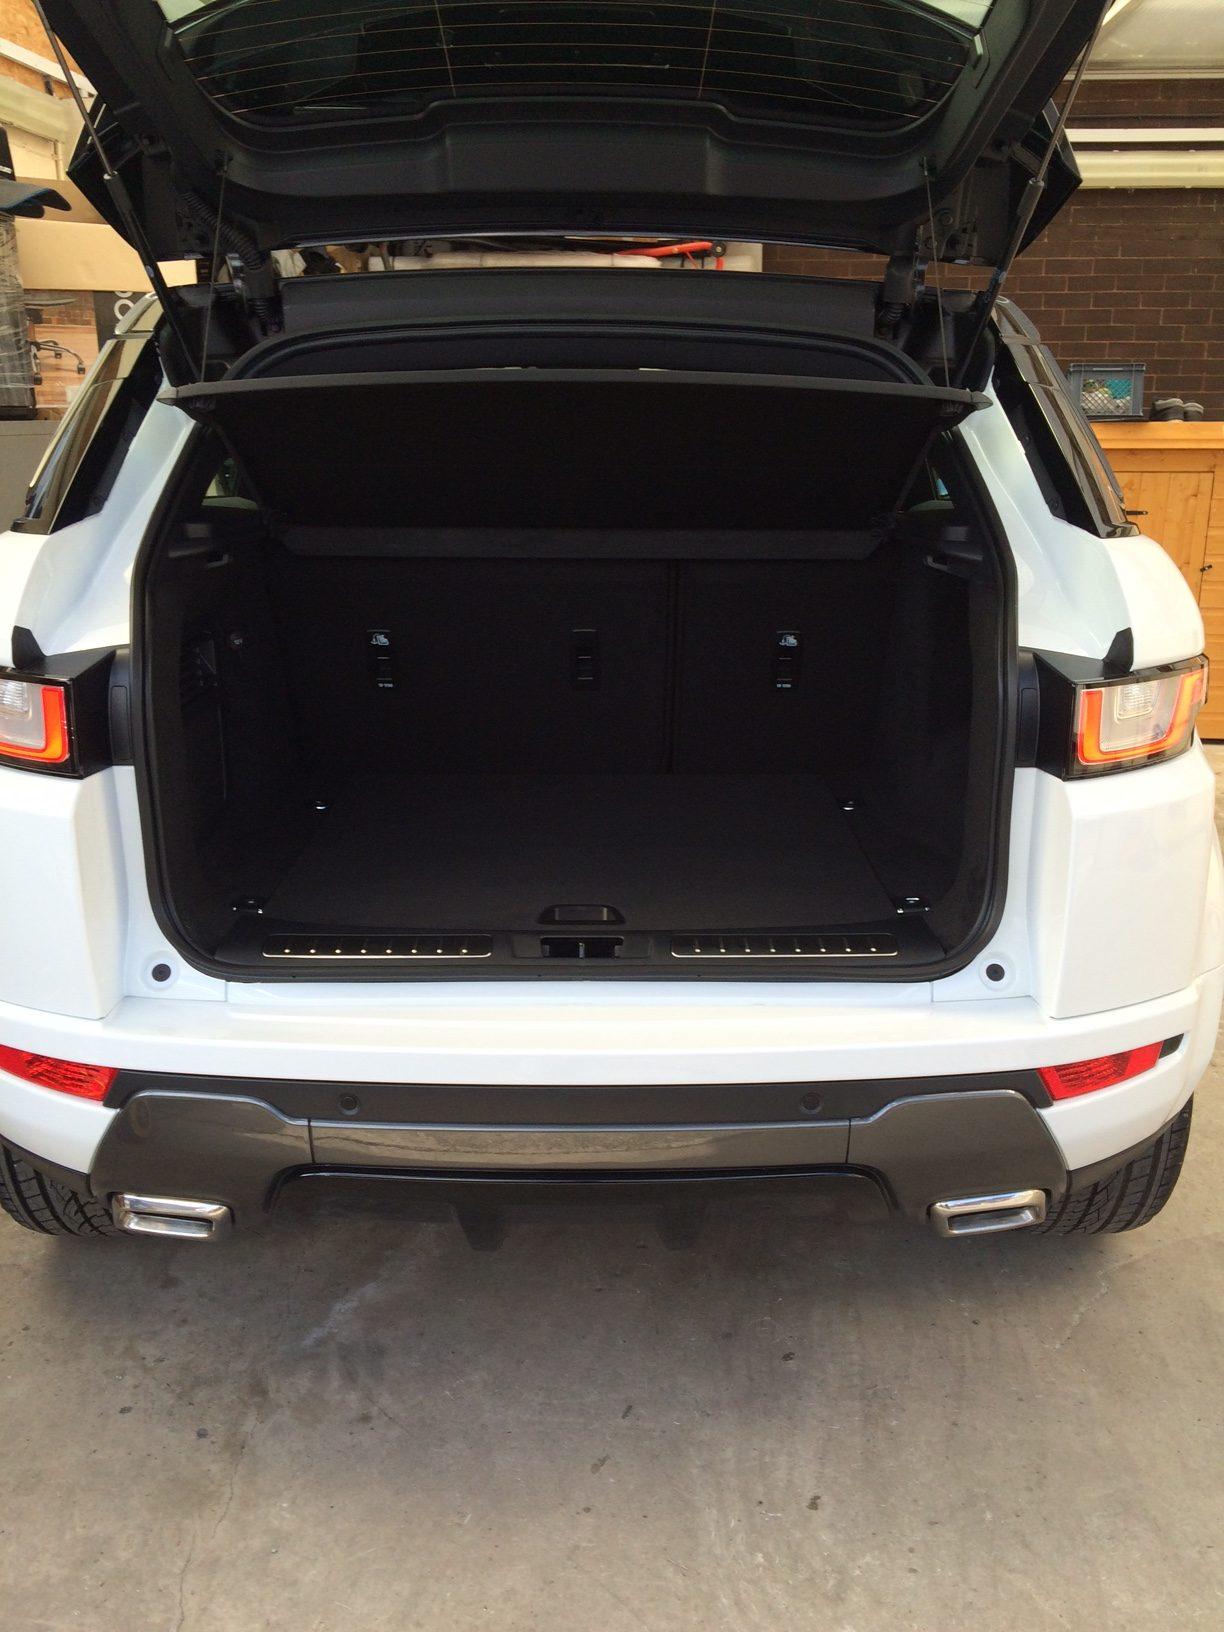 range-rover-evoque-diesel-hatchback-2-0-td4-hse-dynamic-5dr-auto-car-leasing-offers